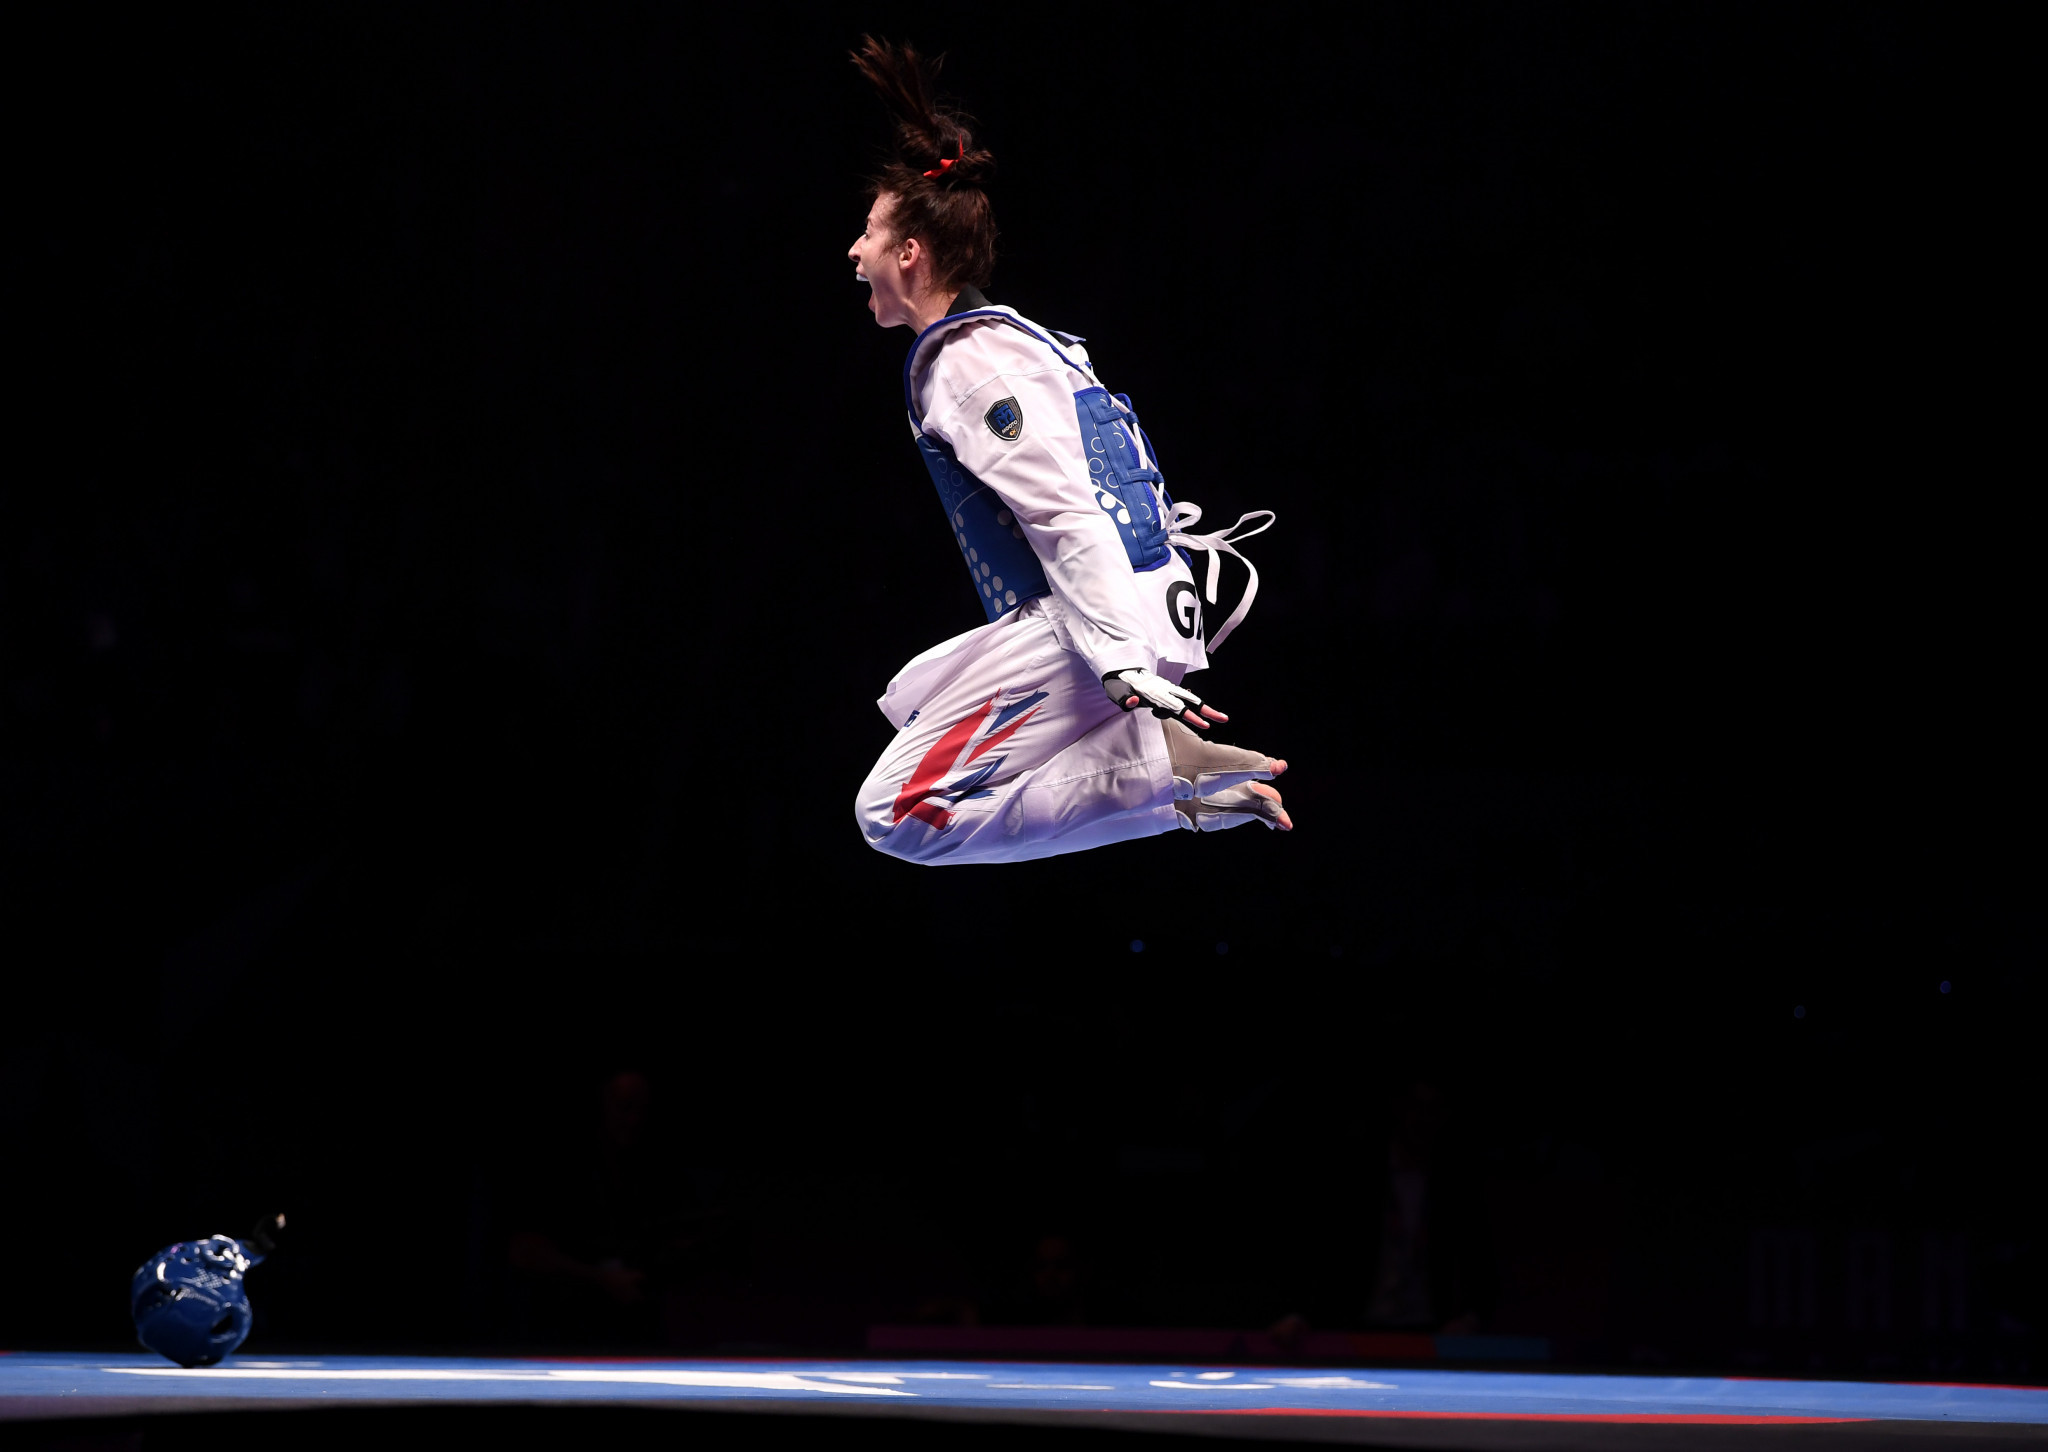 Walkden controversially wins third consecutive title at World Taekwondo Championships